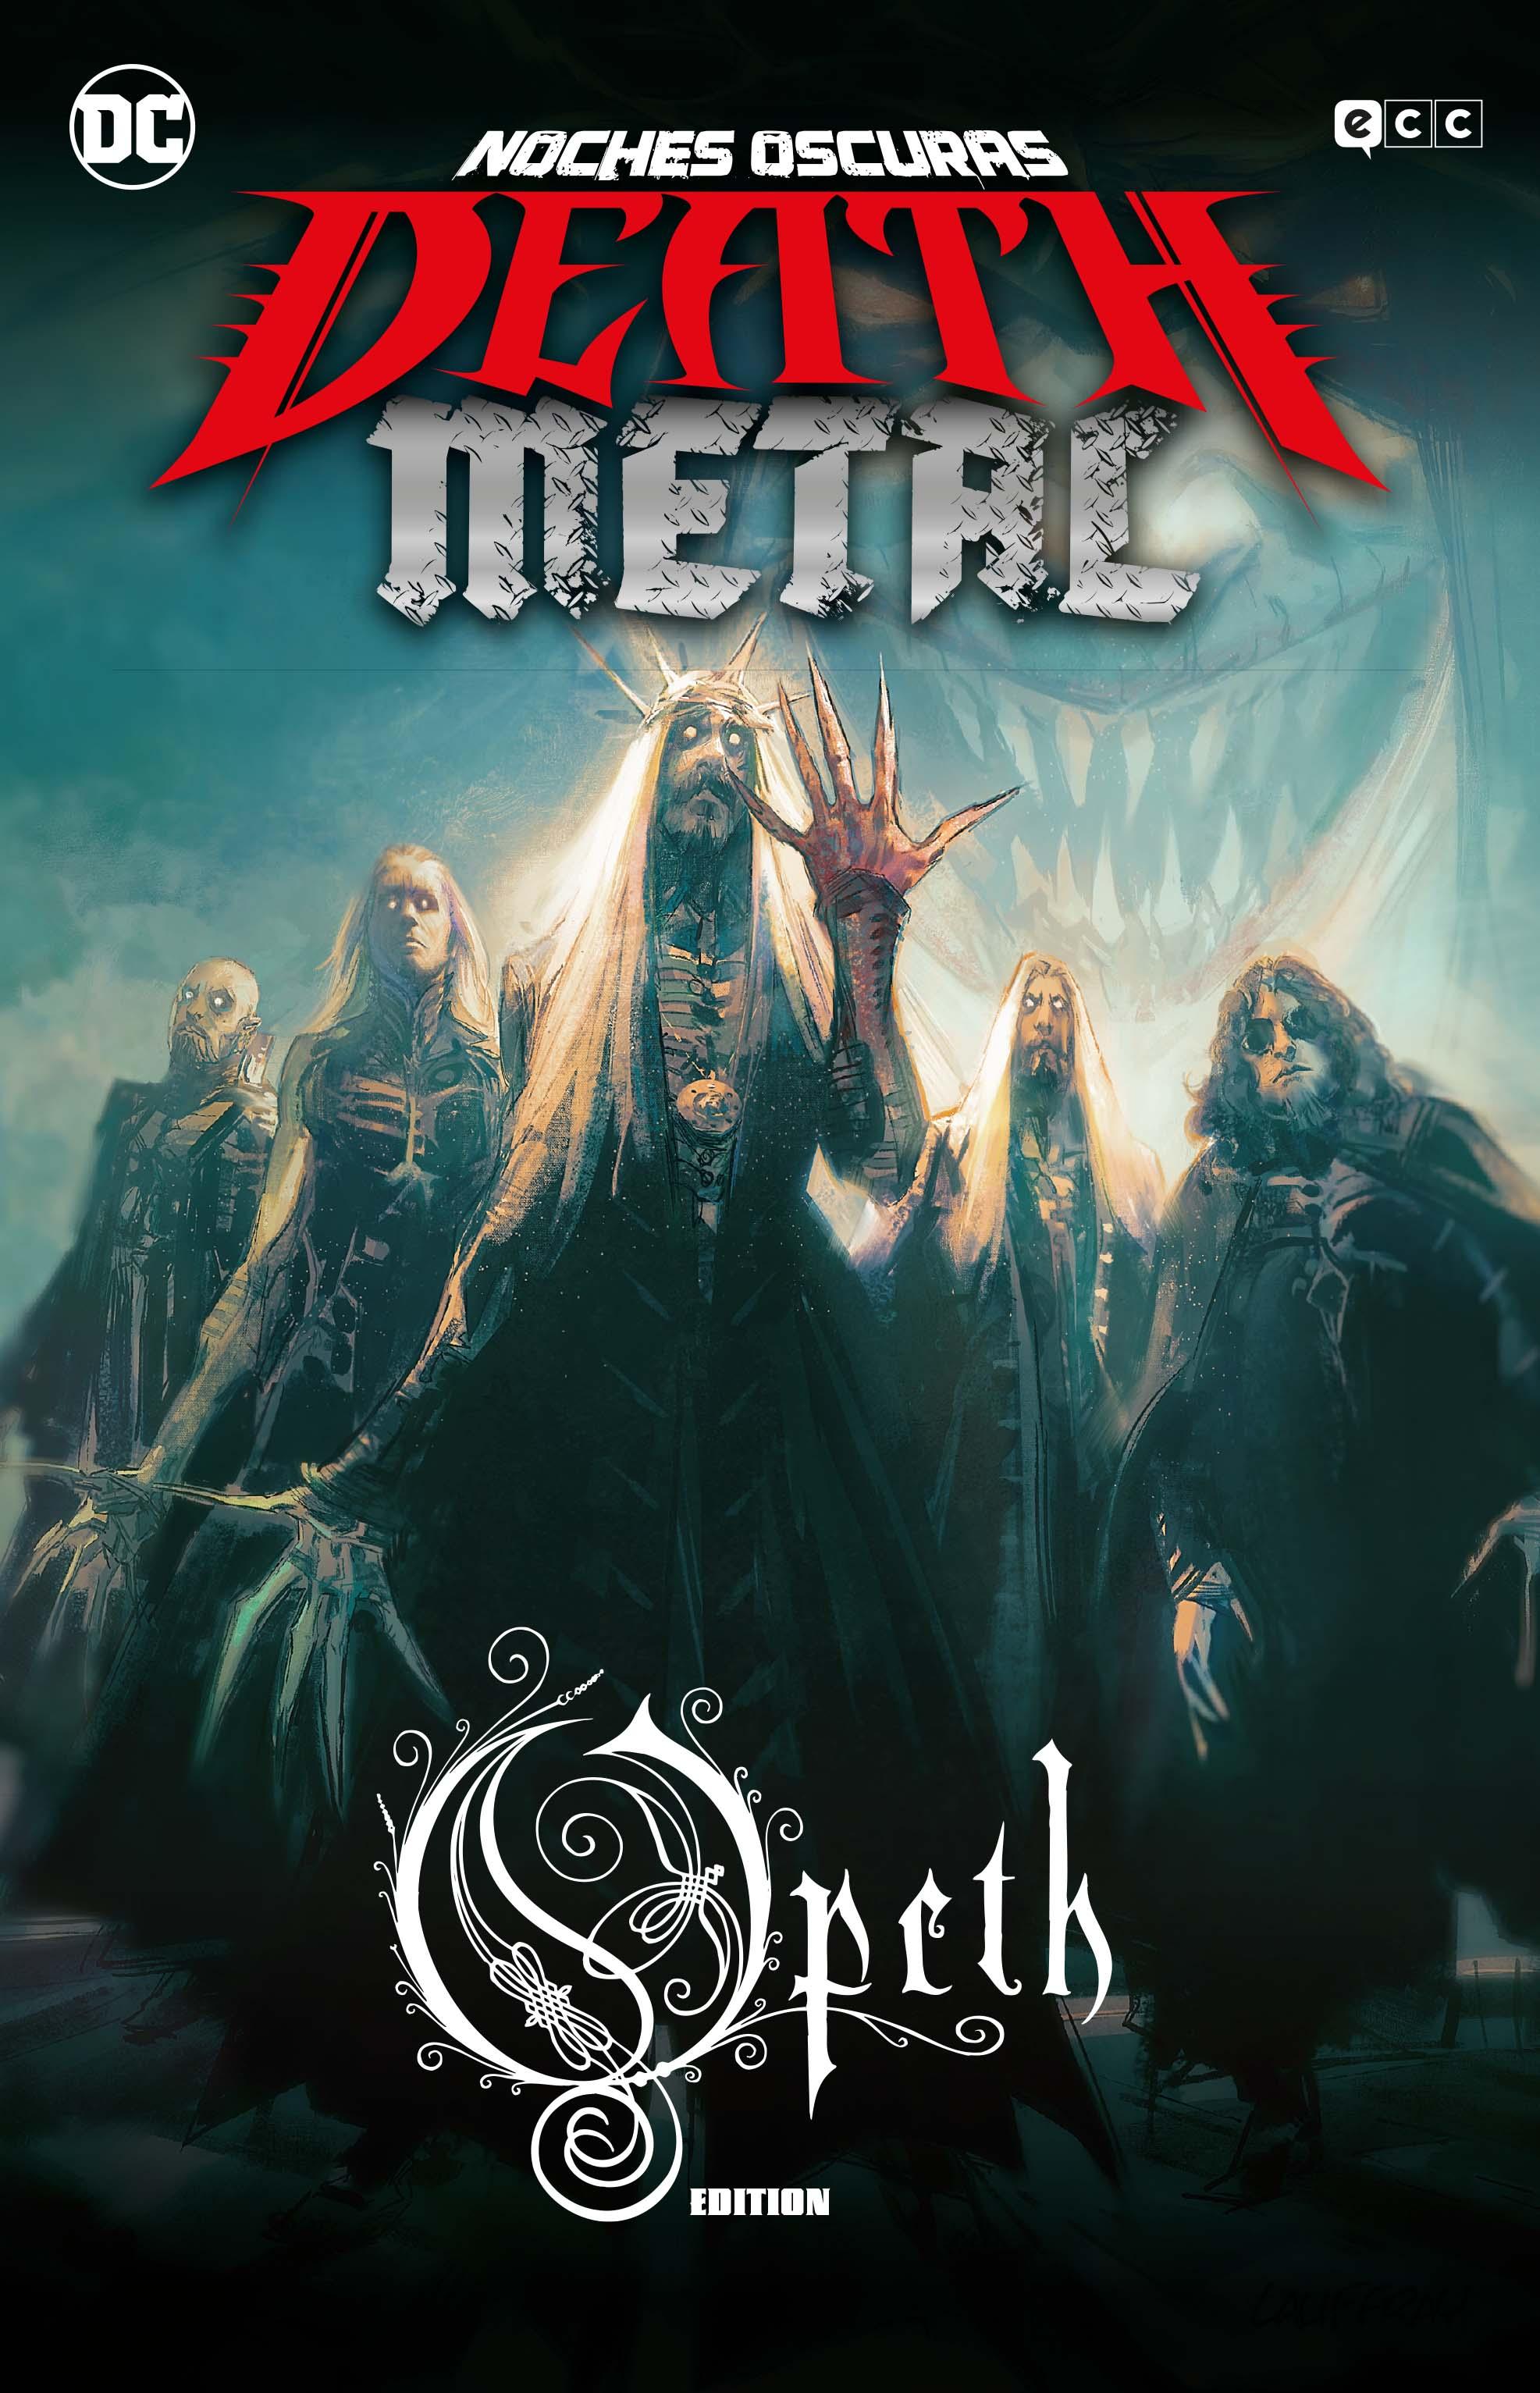 ECC - Noches oscuras: Death Metal núm. 4 (Opeth Band Edition) (Rústica)